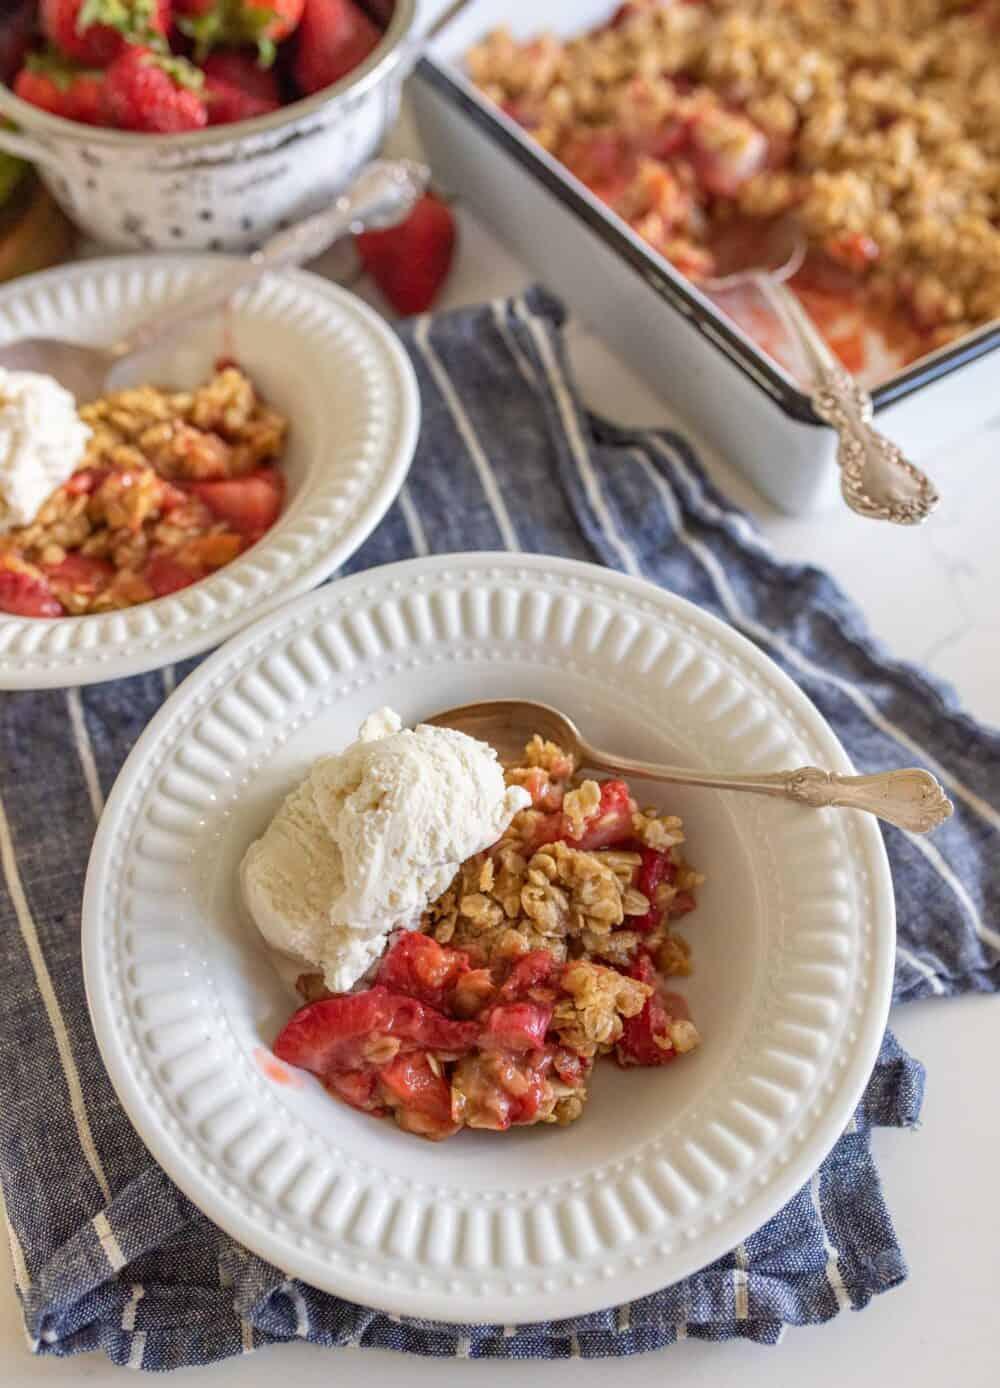 one serving of rhubarb crisp with vanilla ice cream on top